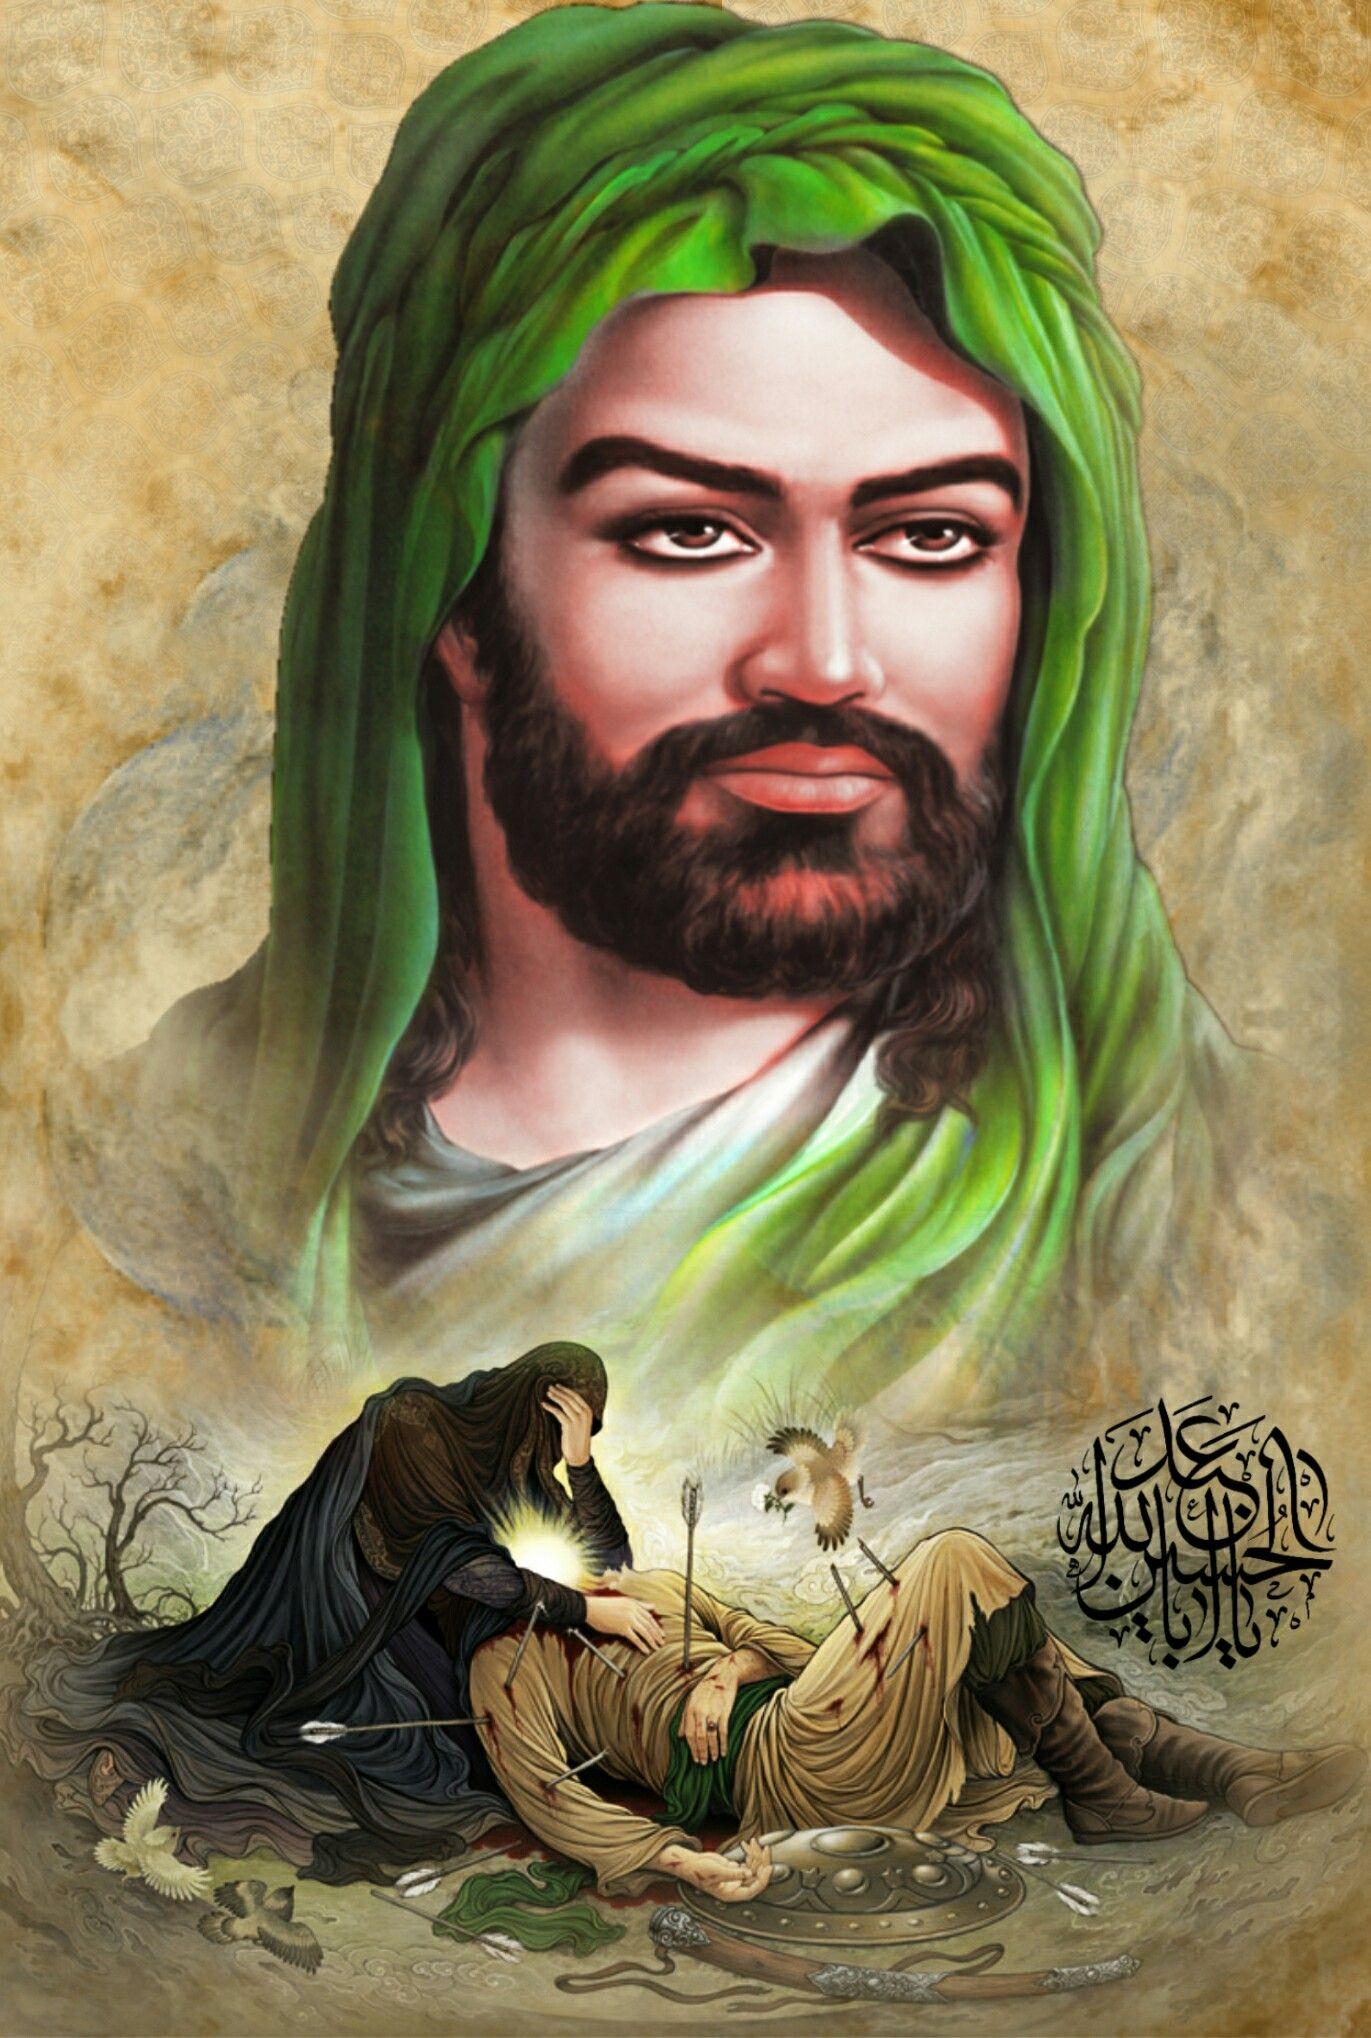 картинки про пророка мухаммеда саду появляется